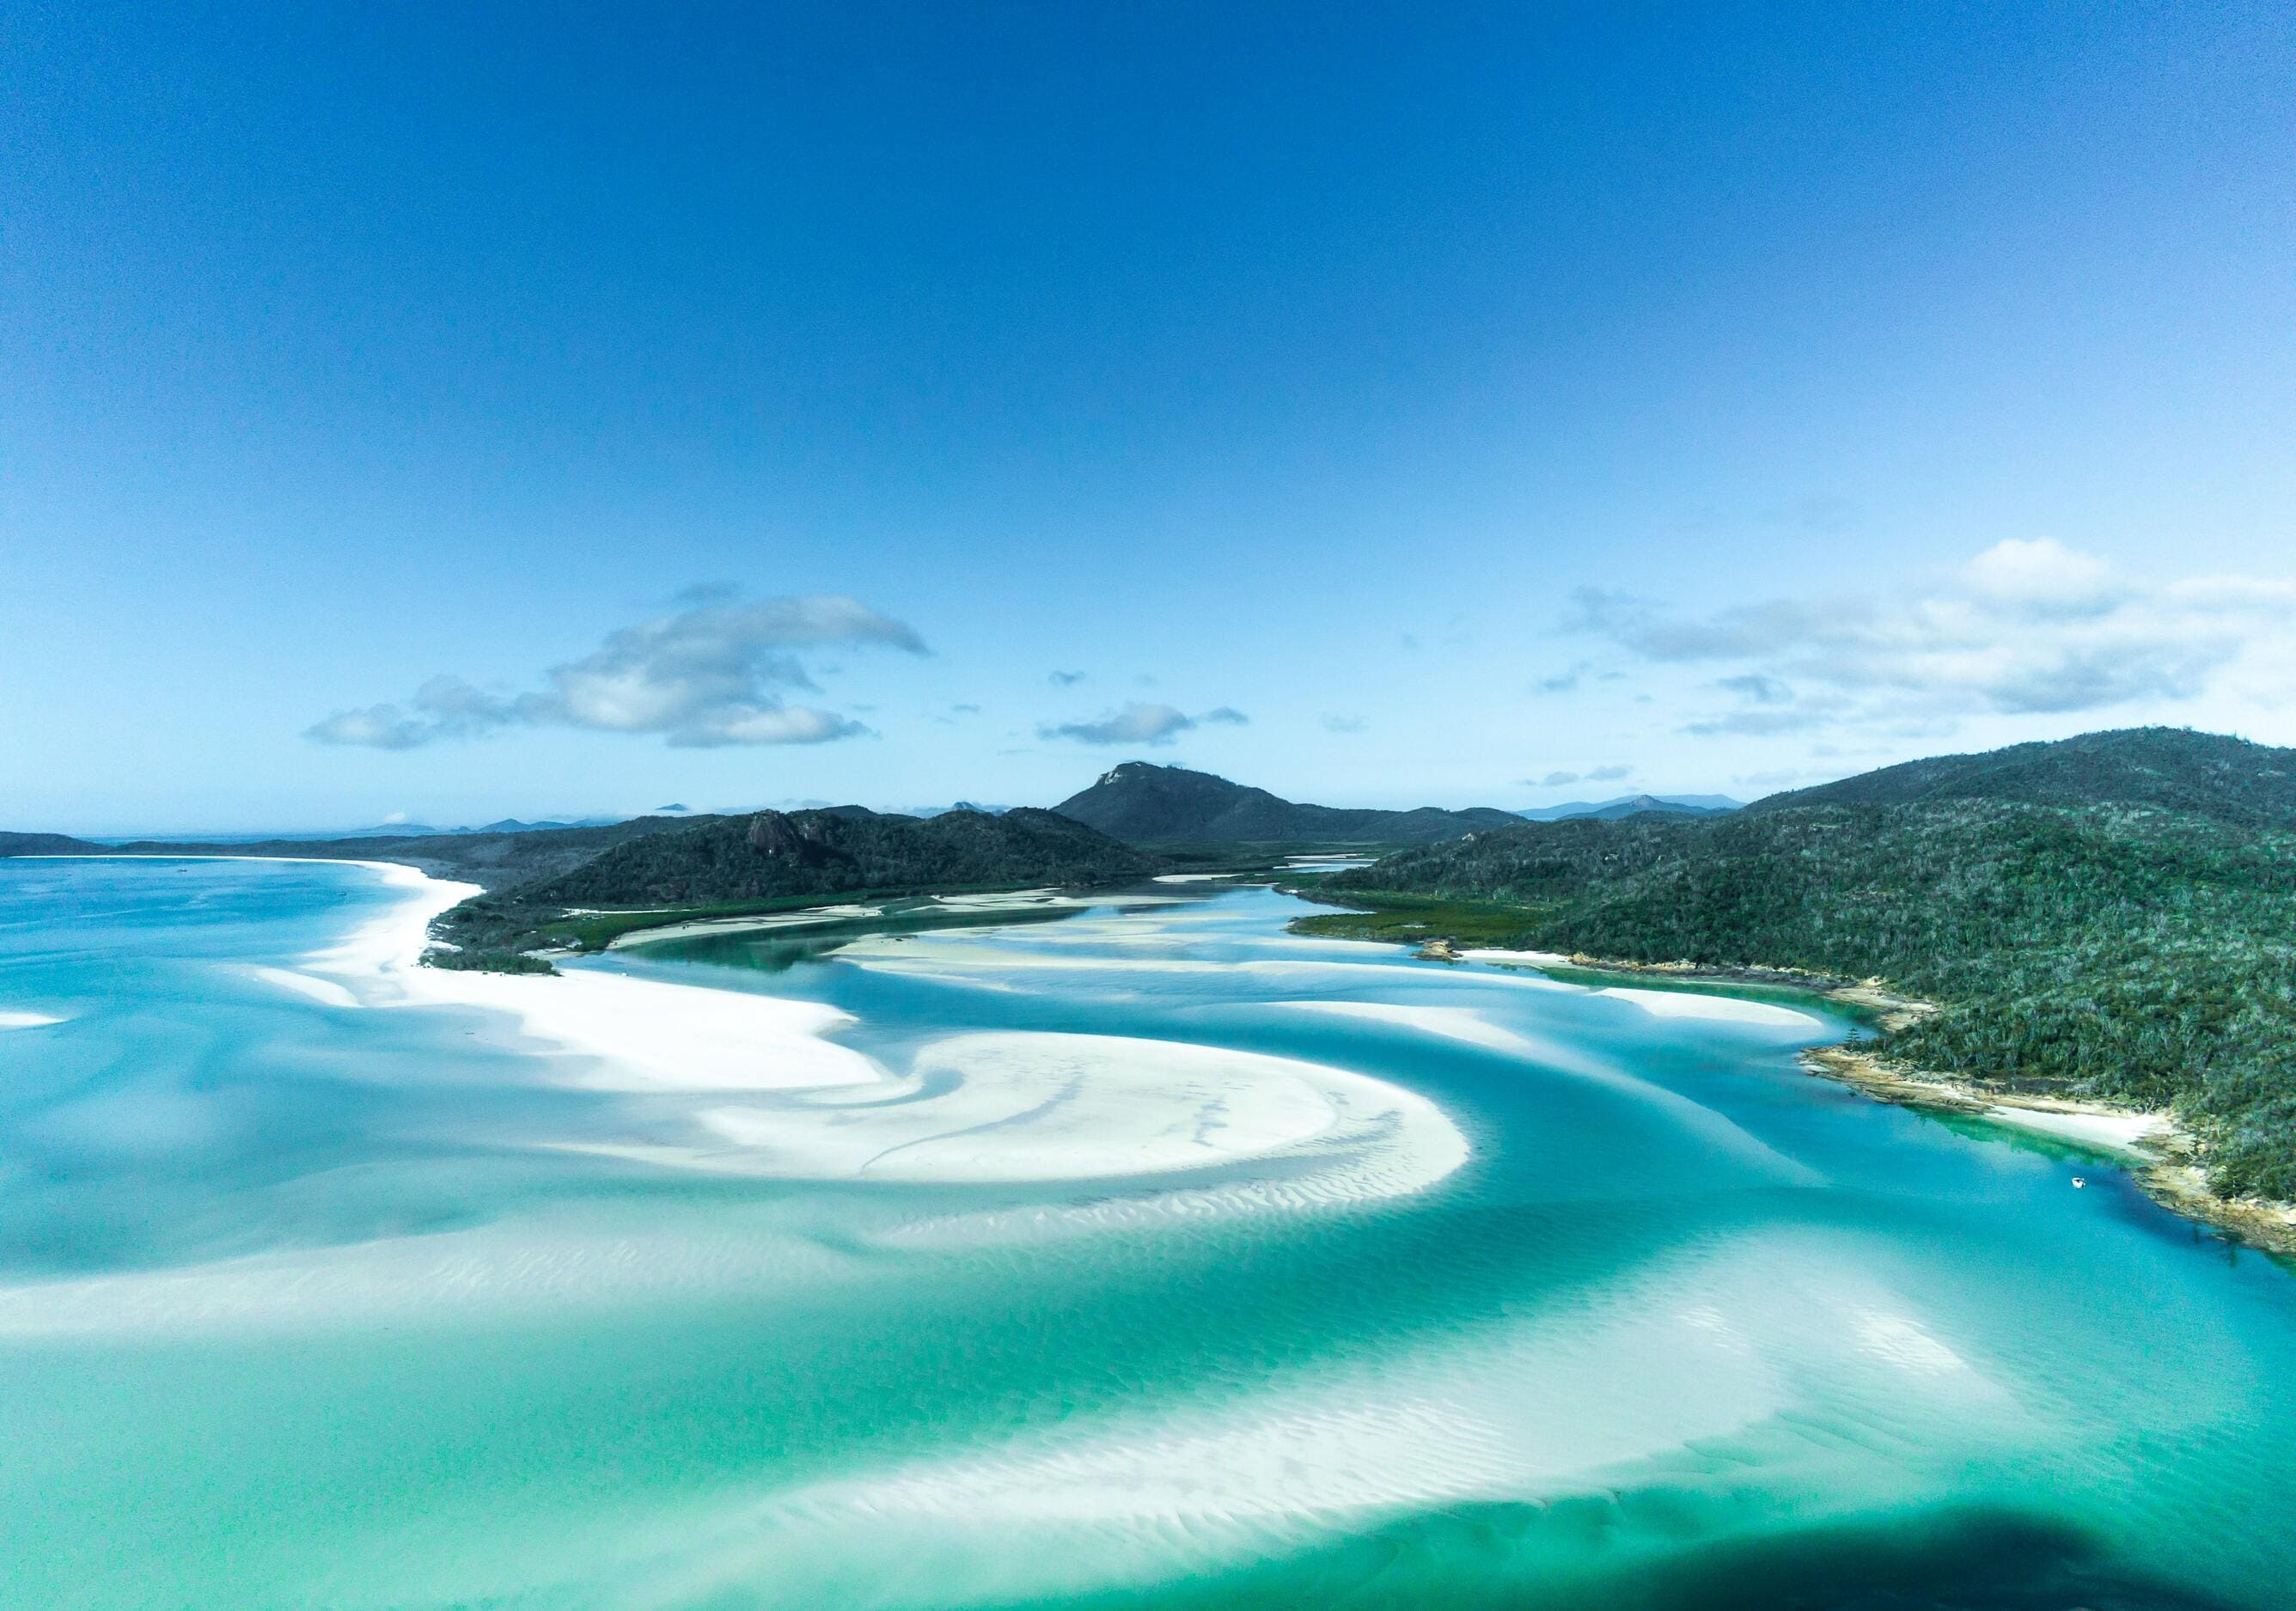 The Whitsundays Islands in Queensland, Australia